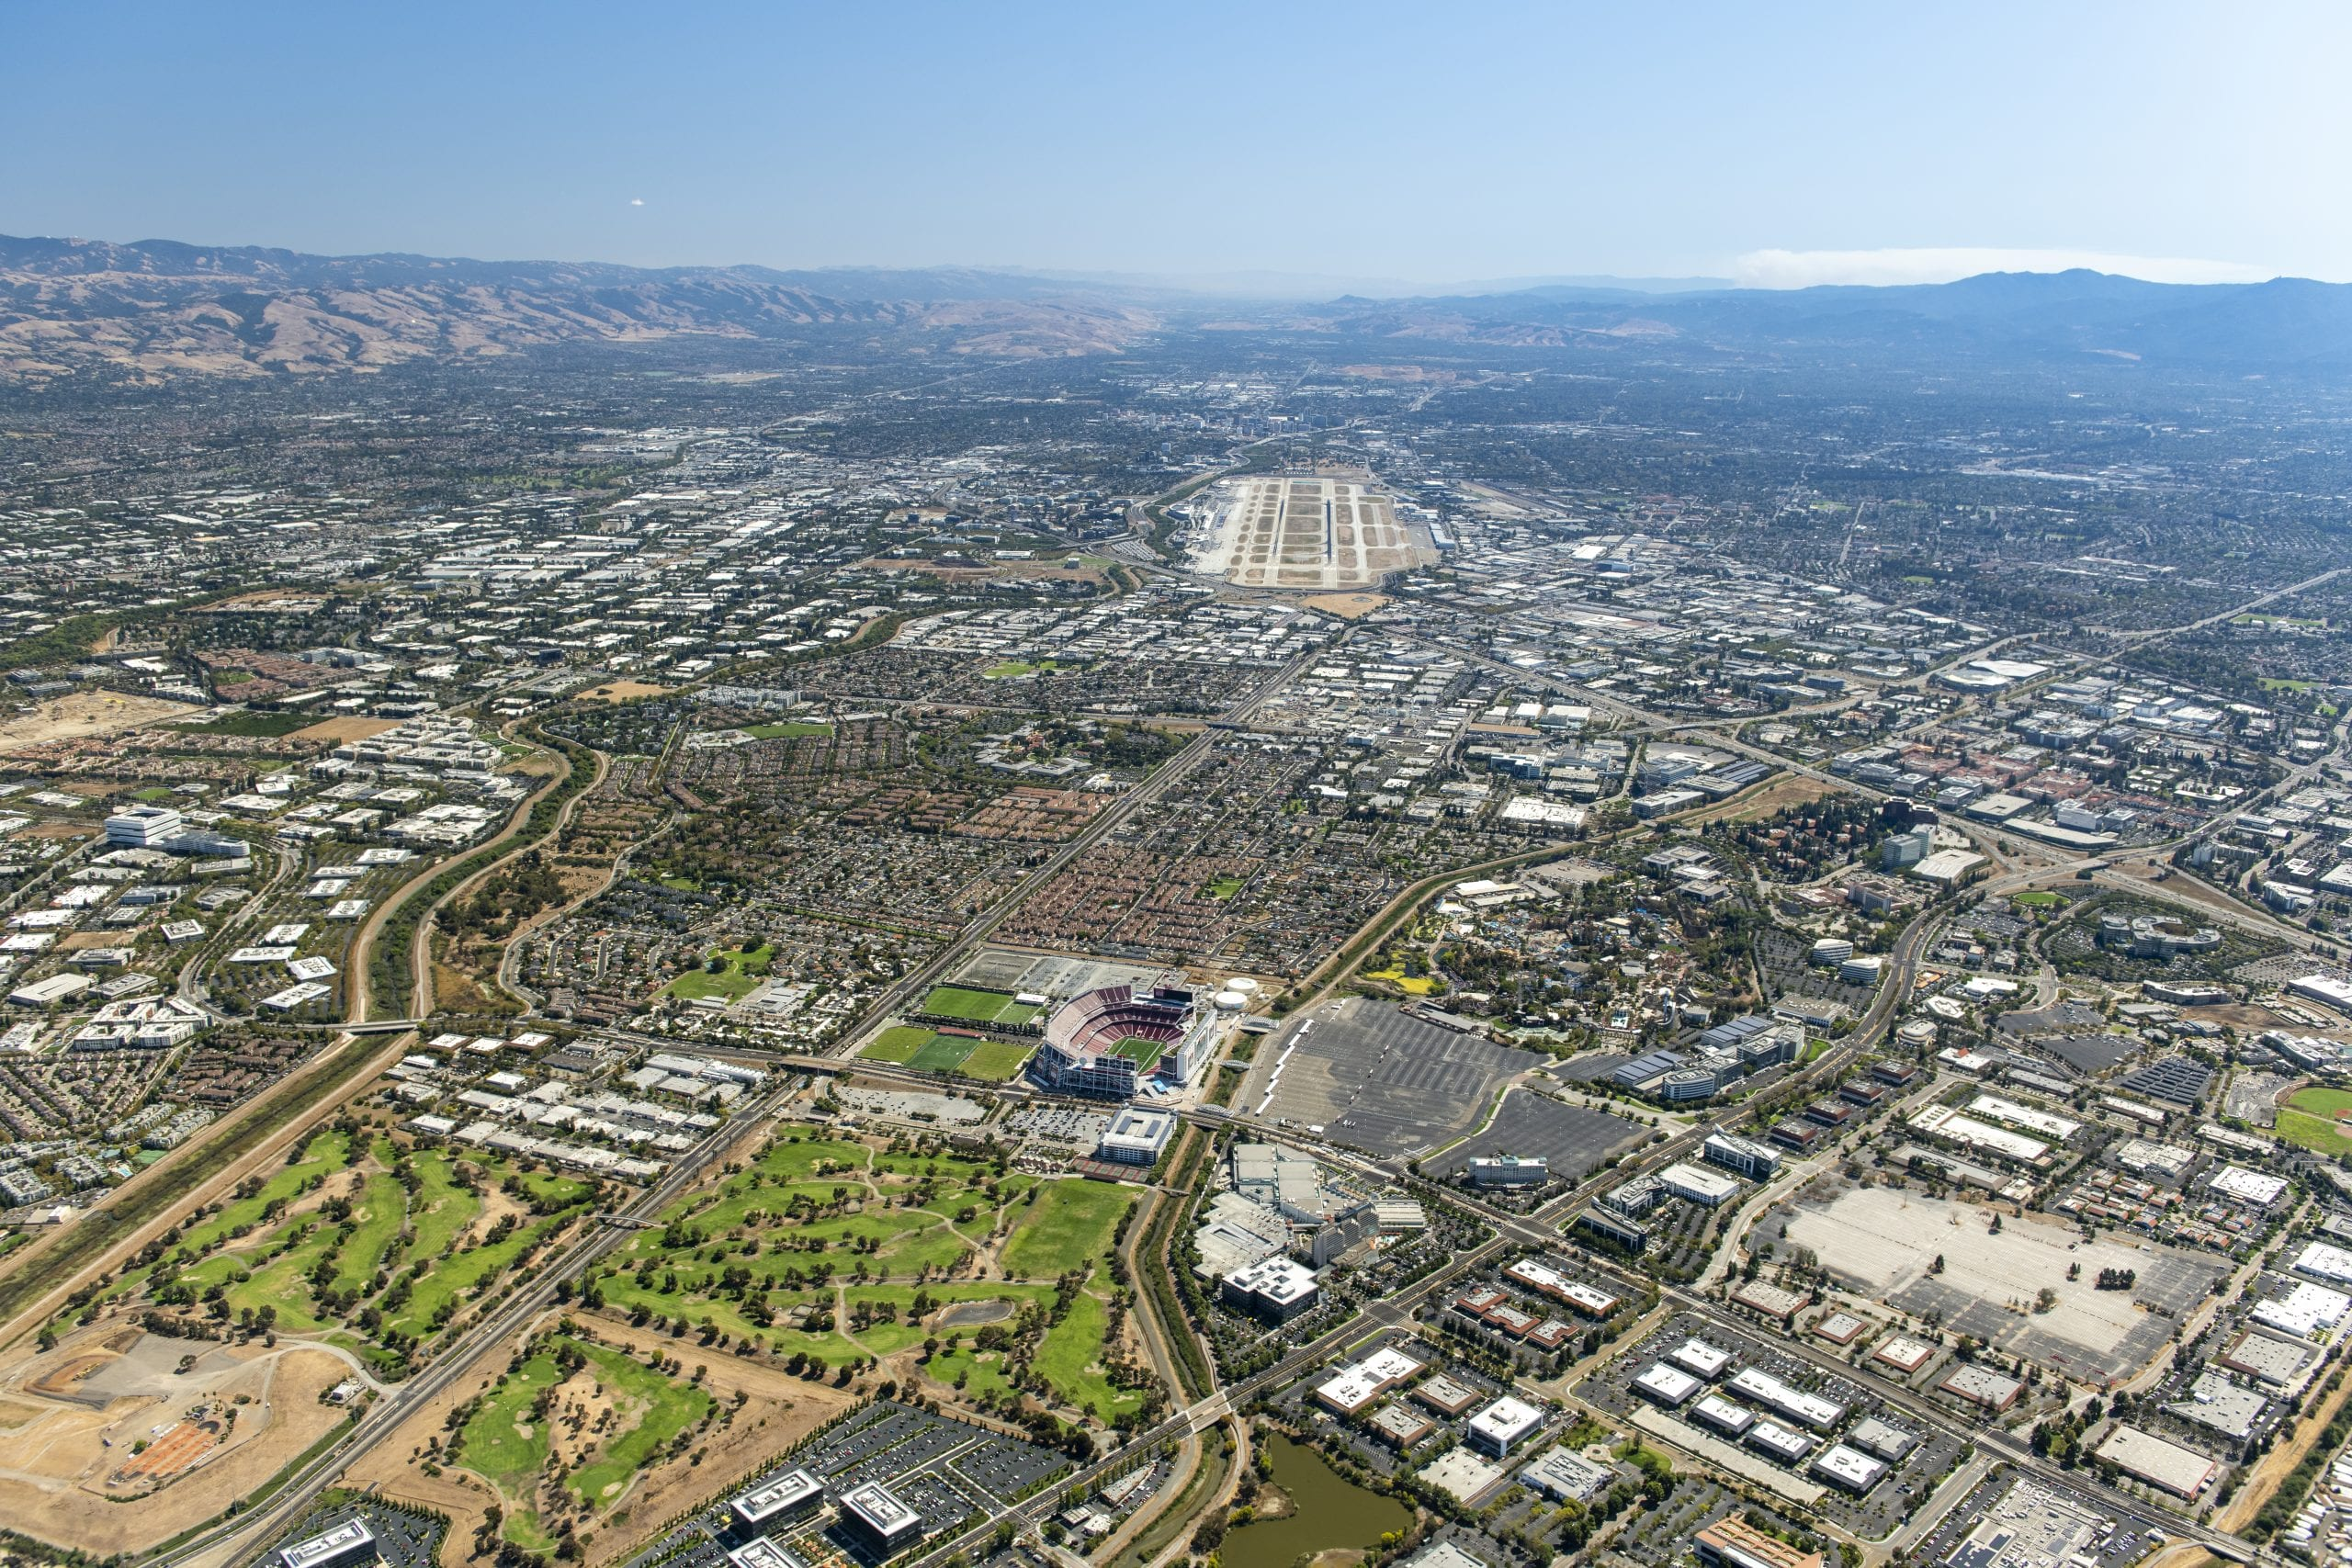 Bay Area hiring dips 25 percent since coronavirus shutdowns: report